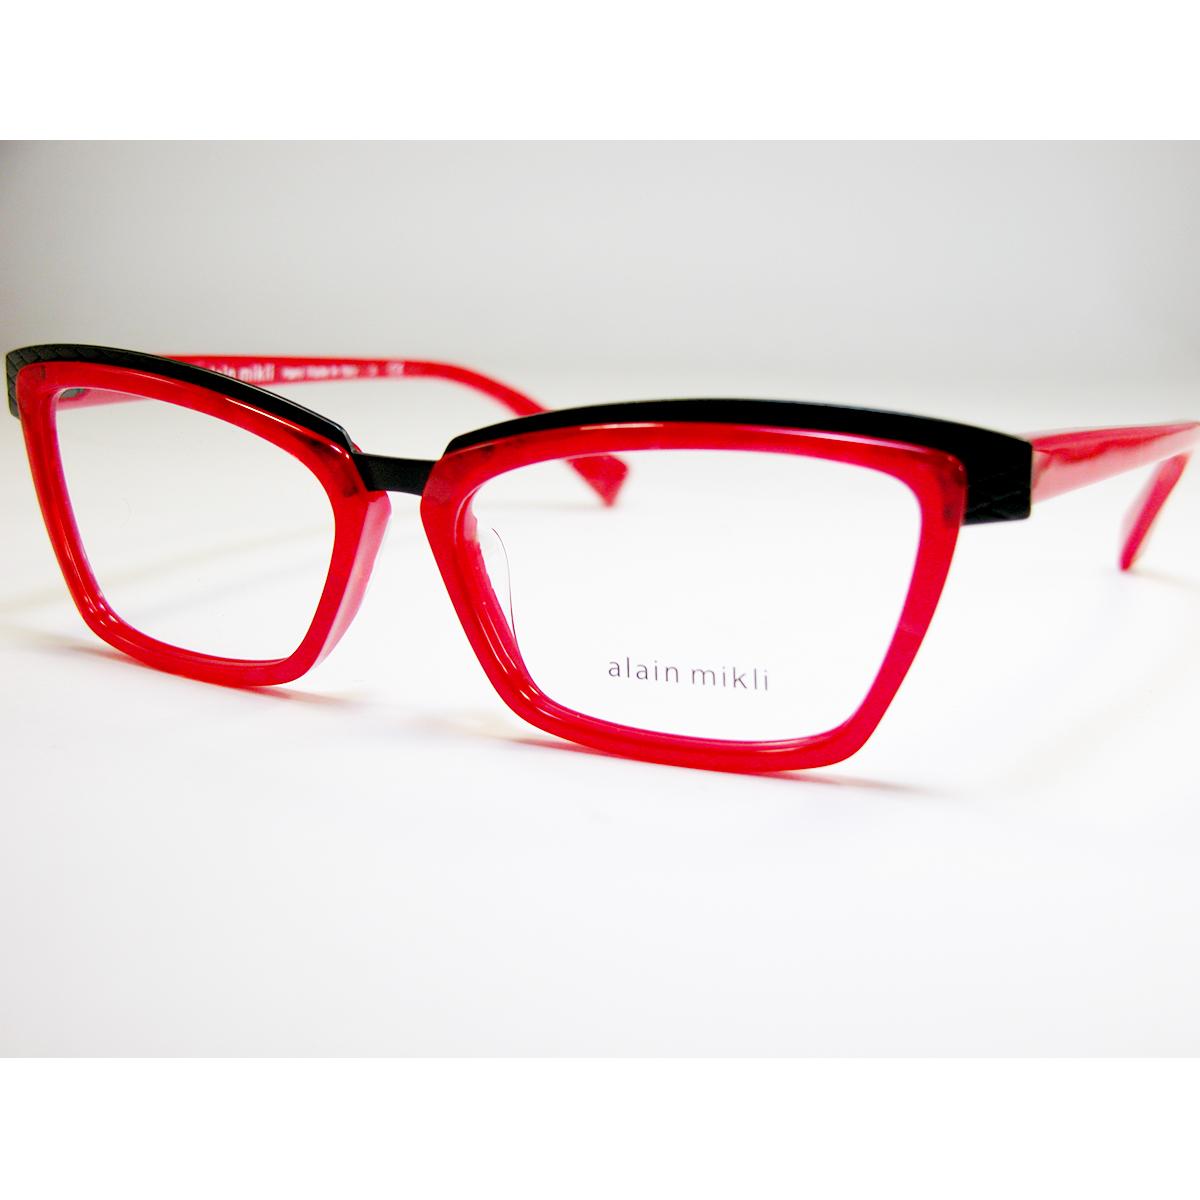 alain mikli アランミクリ メガネAO2015A カラー1055 メンズ メガネ サングラス 眼鏡【ありがとう】【店頭受取対応商品】